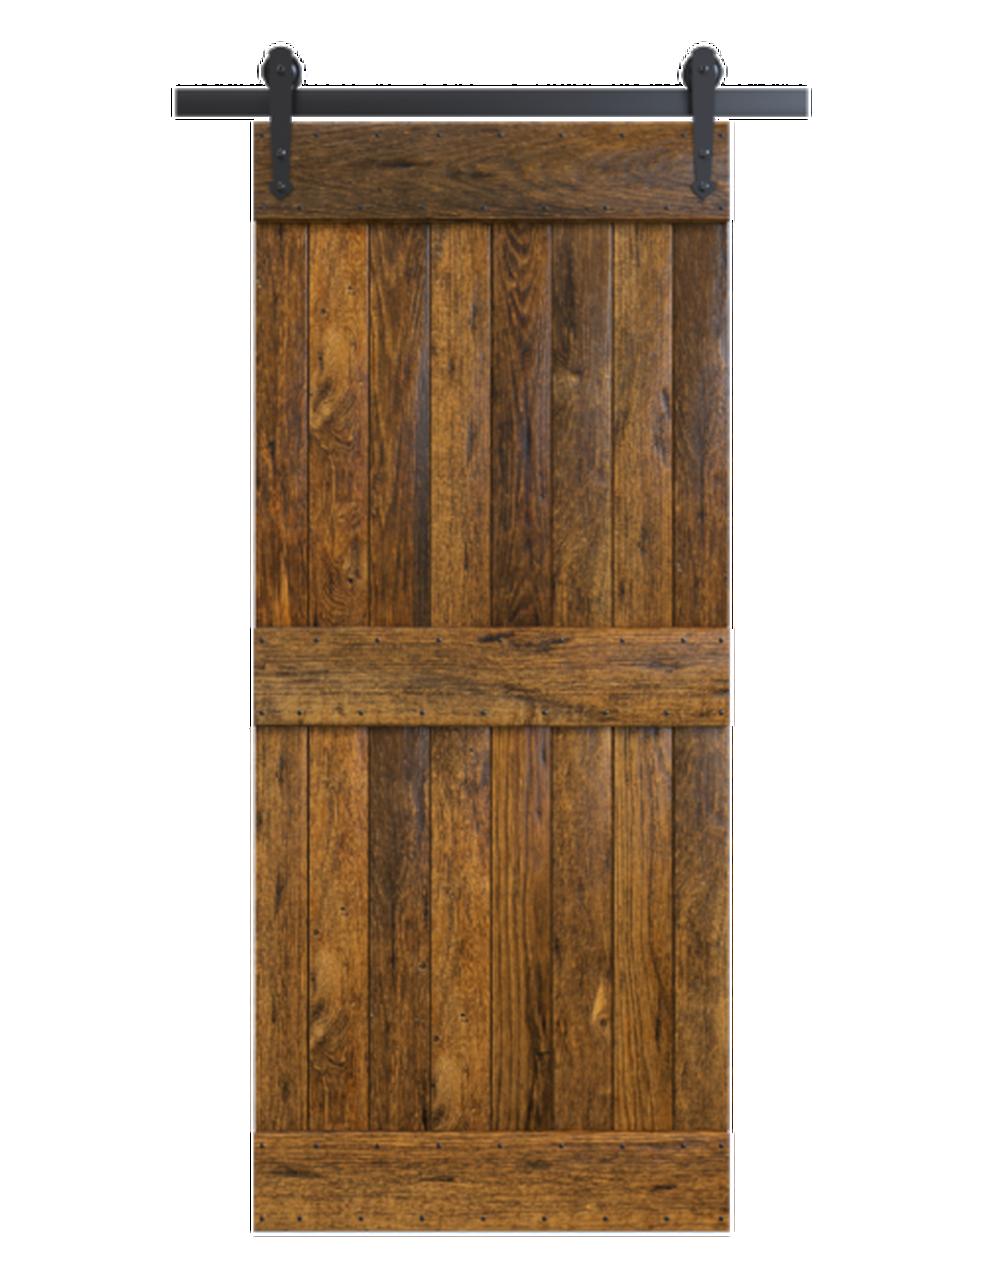 2 panel rustic stained wood barn door